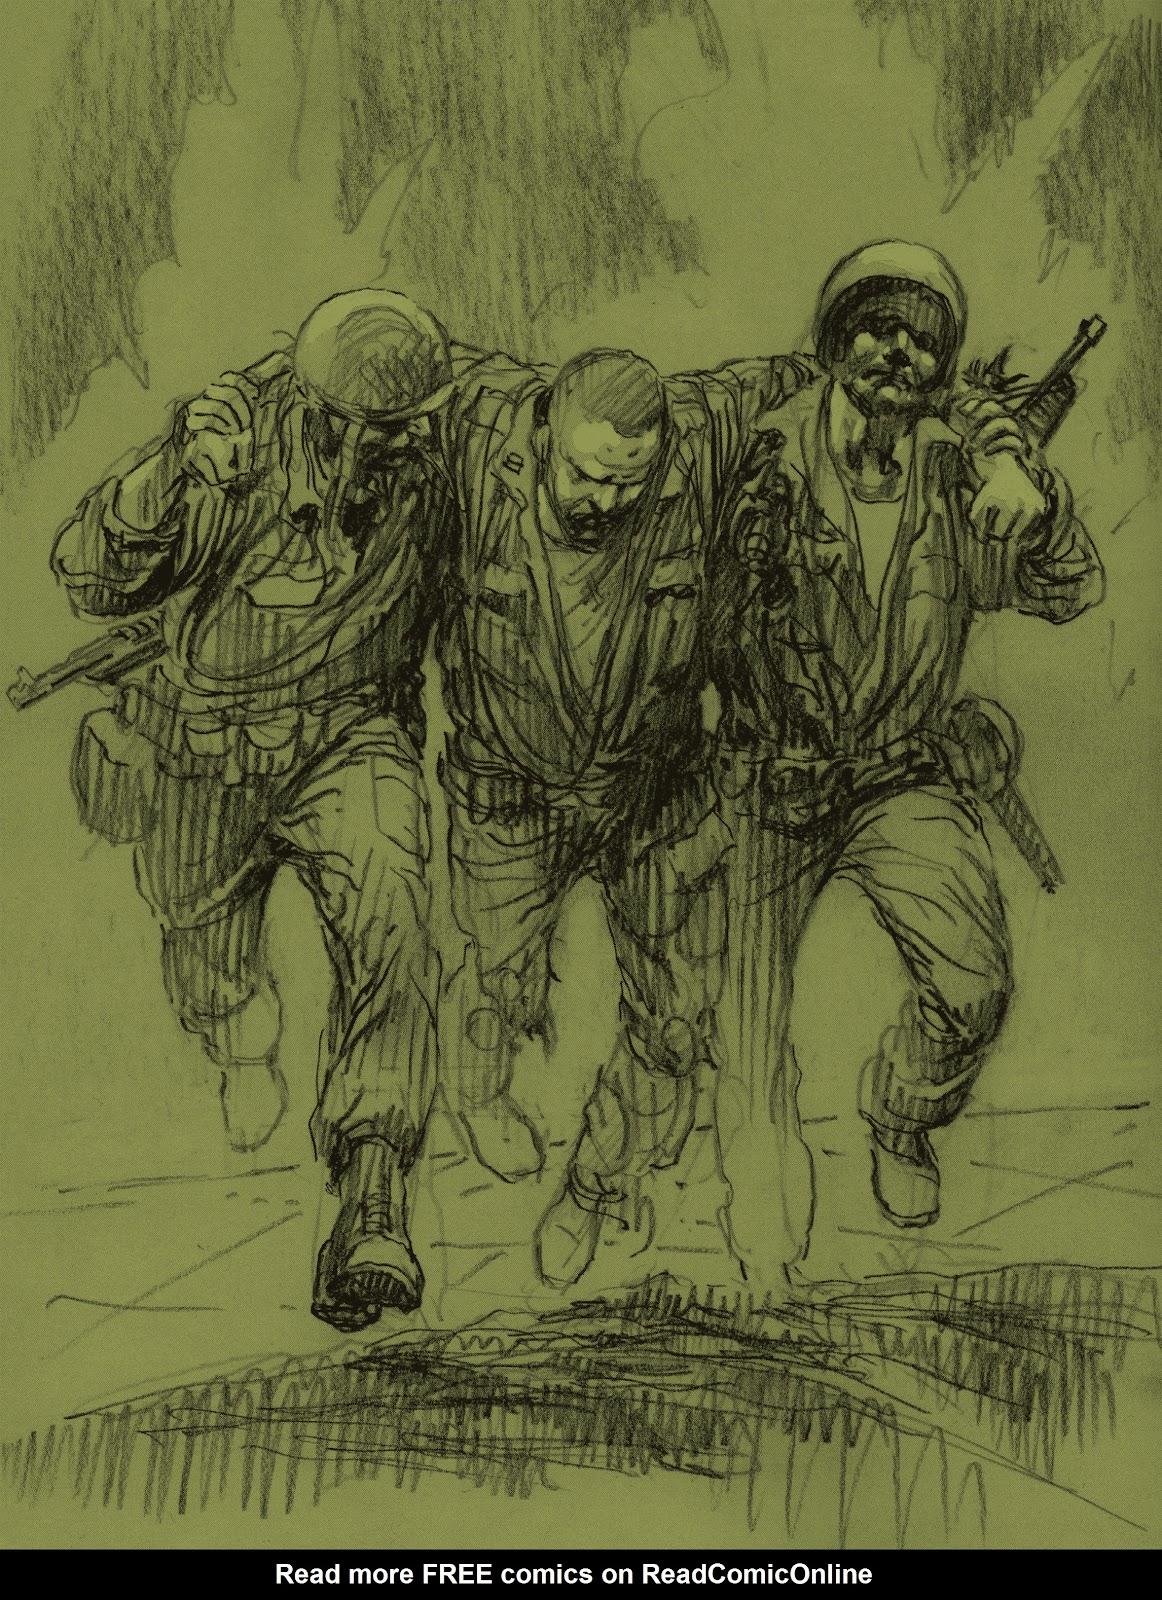 Read online The Art of Joe Kubert comic -  Issue # TPB (Part 2) - 96